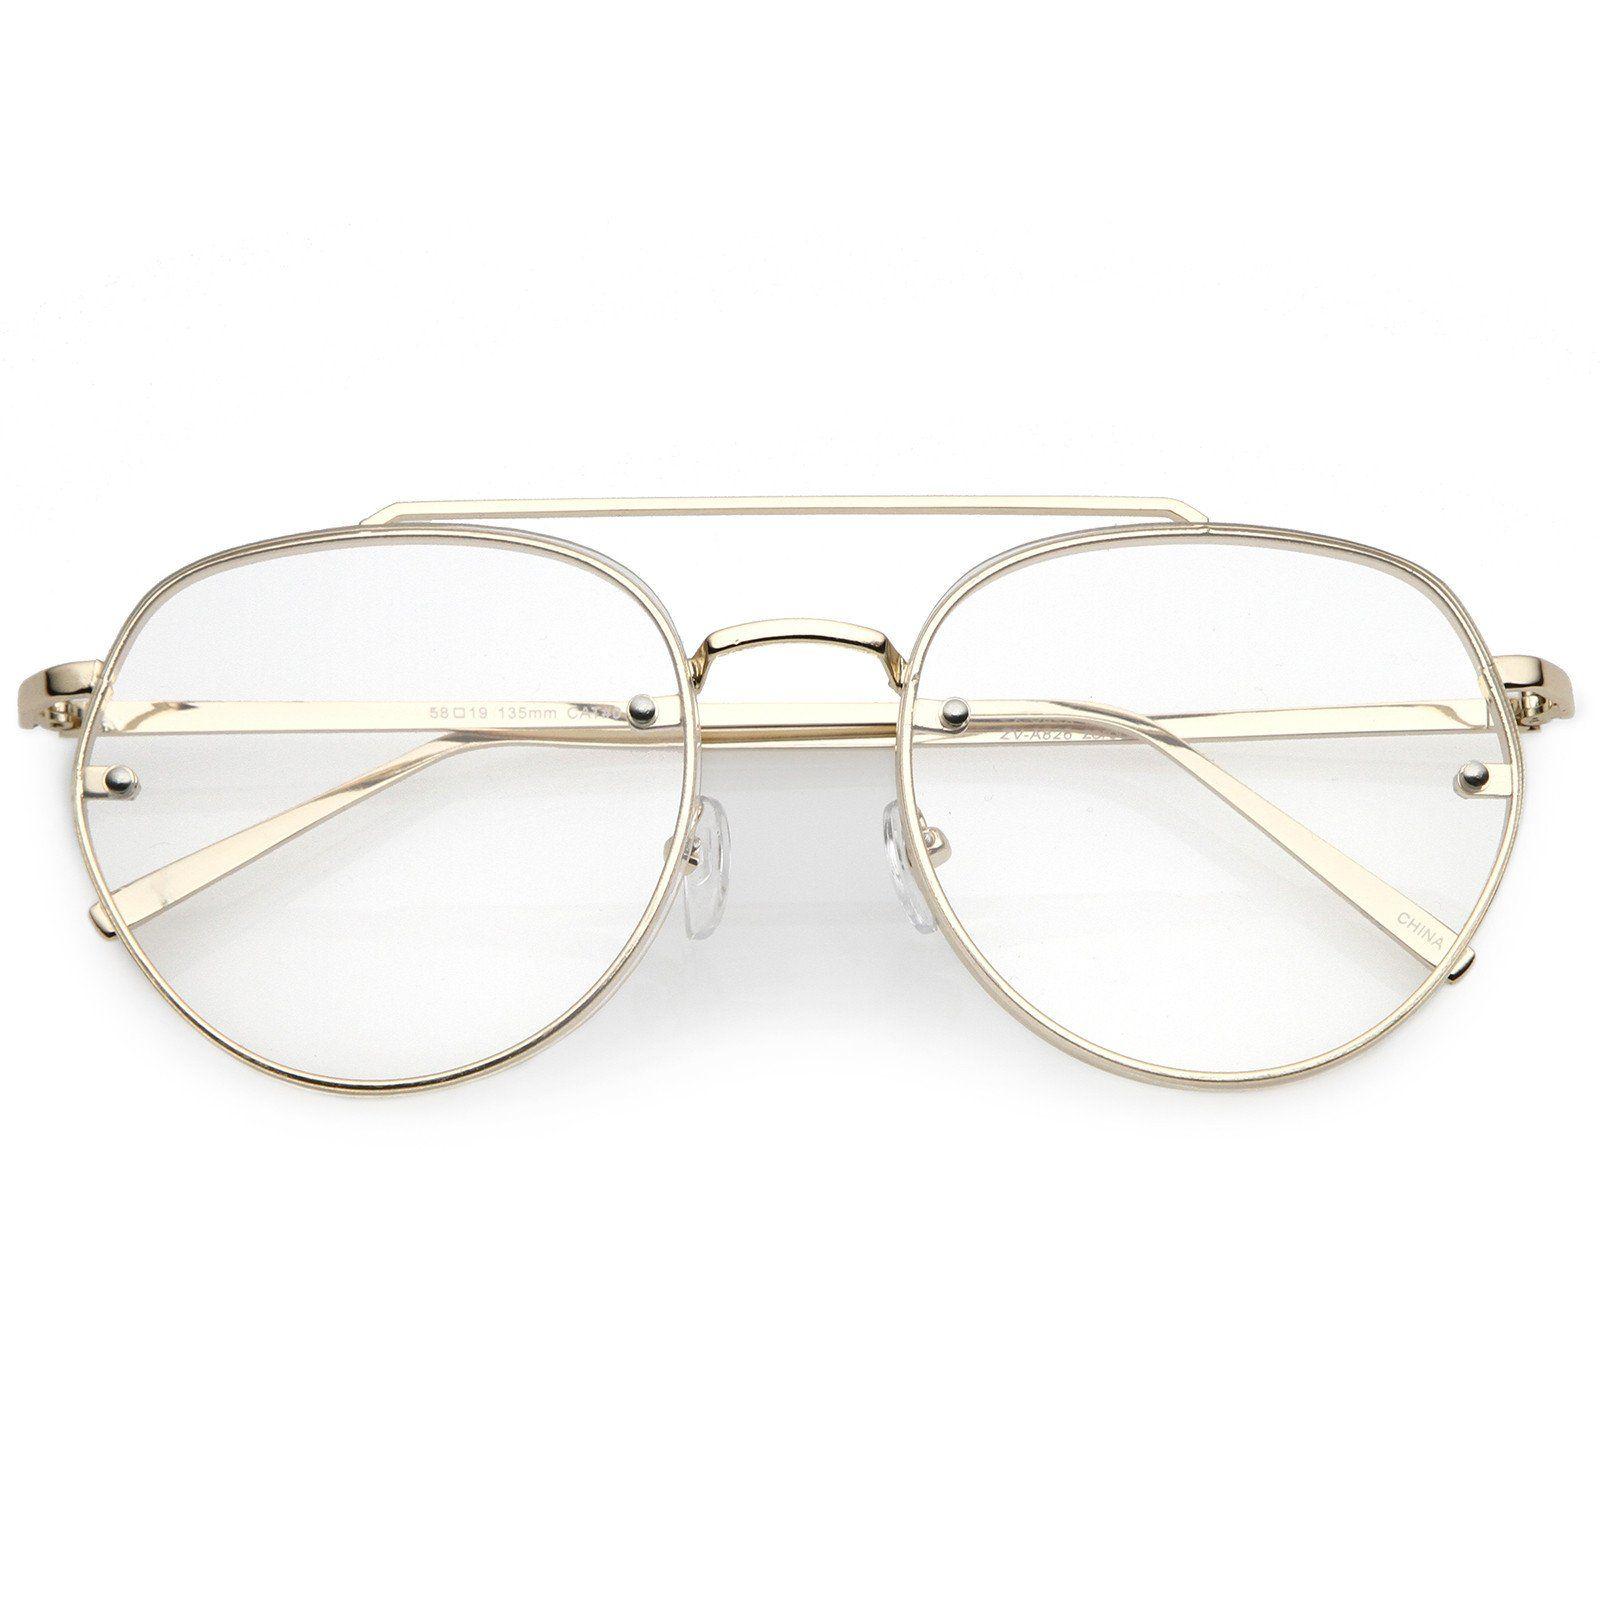 1ea5dacb039 Modern Round Aviator Eyeglasses Slim Brow Bar Rimless Clear Flat Lens 59mm   frame  bold  mirrored  cateye  sunglassla  womens  purple  summer   sunglasses   ...